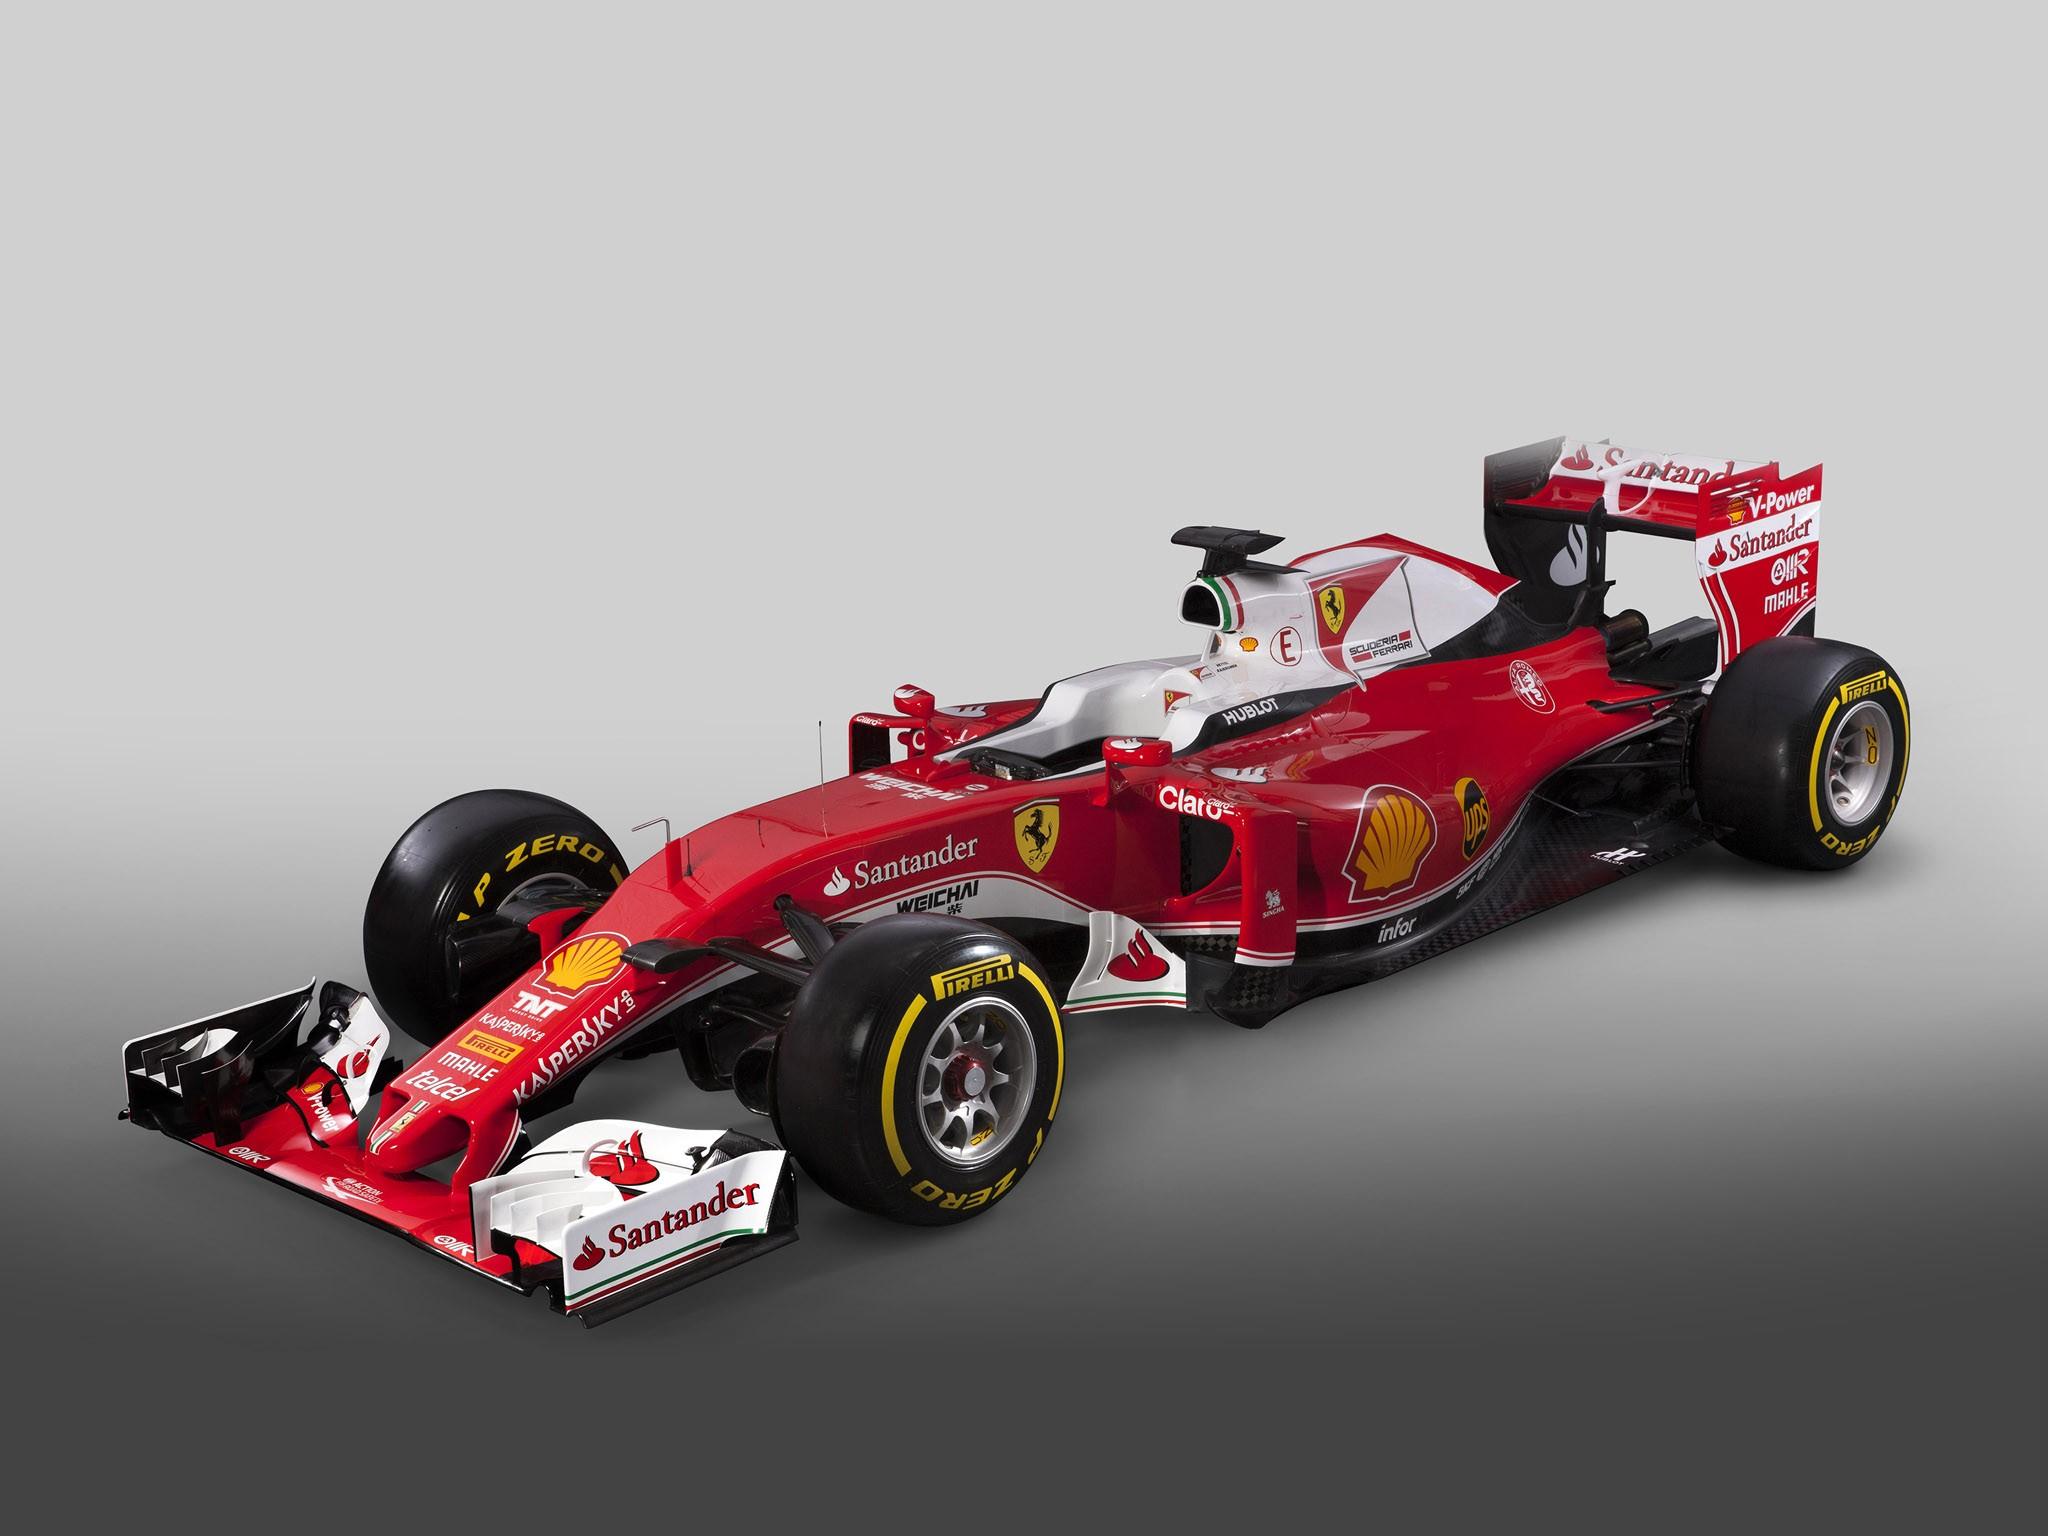 Ferrari V6 Turbo Hybrid SF16 H F1 2016